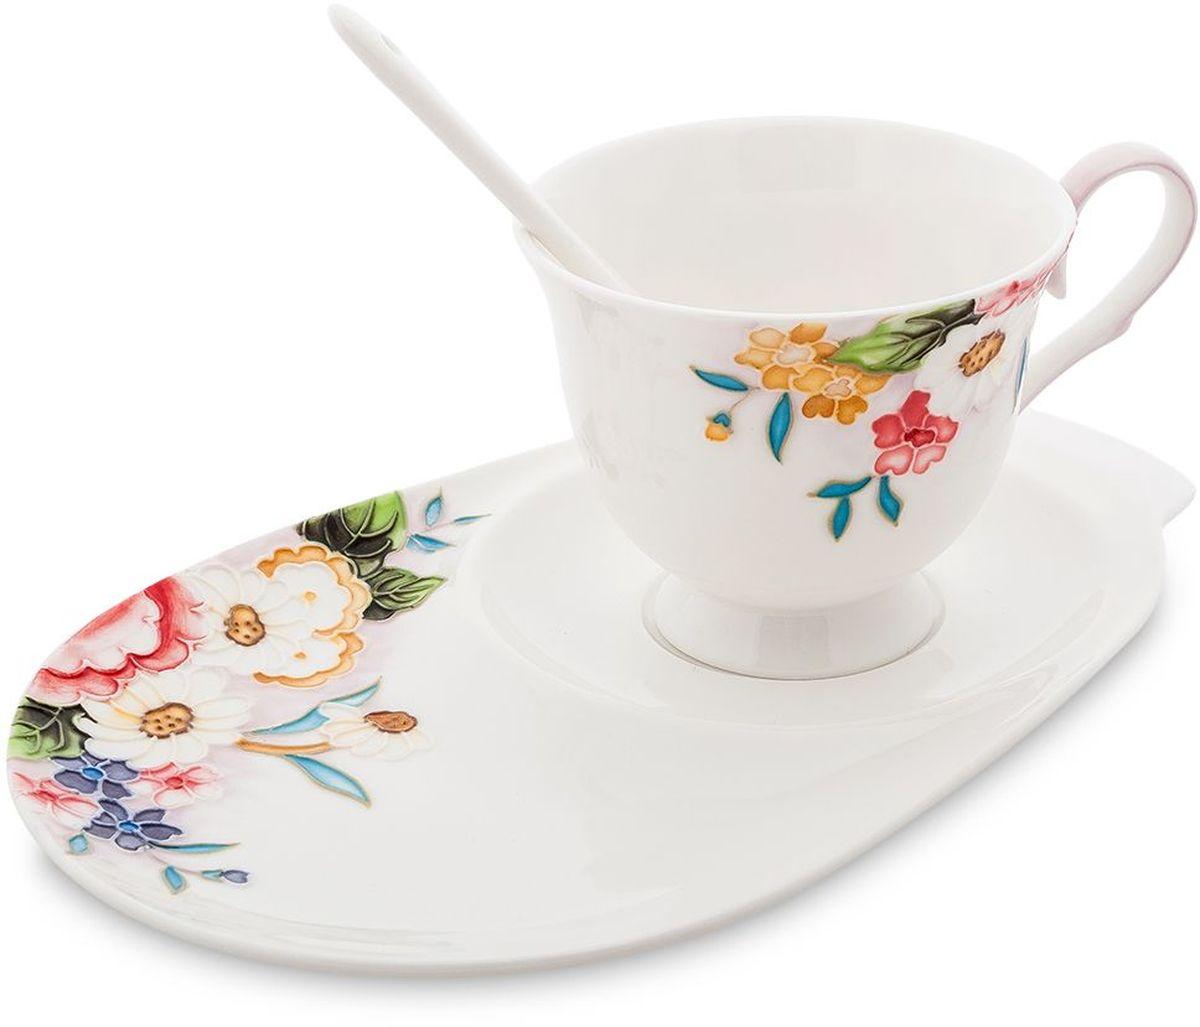 Чайная пара Pavone Королева Камилла, 3 предмета. 451594451594Объем чашки: 250 мл Длина блюдца: 23 см